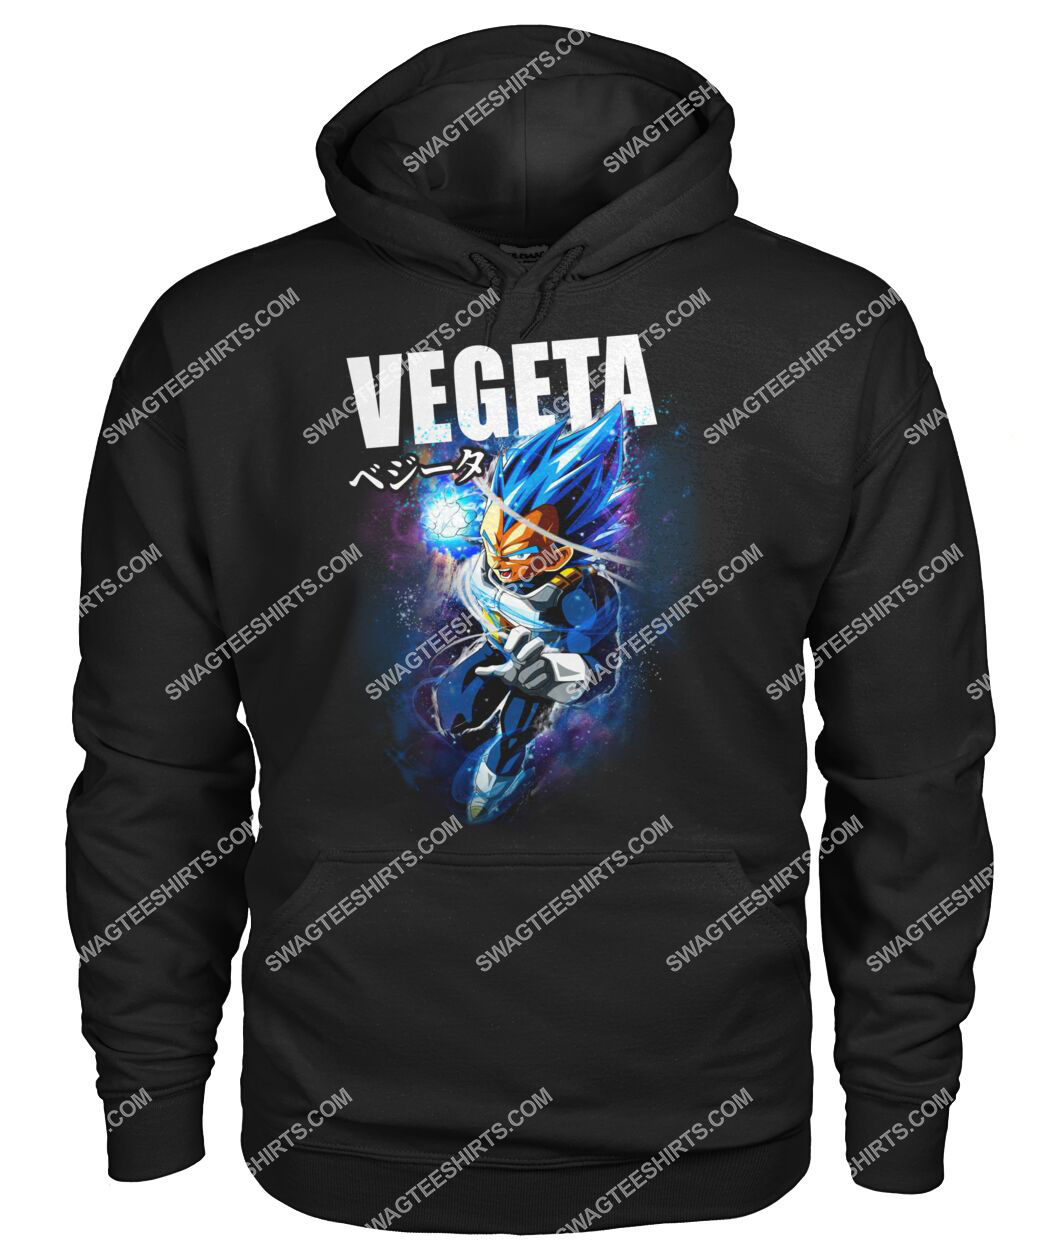 dragon ball z vegeta super saiyan hoodie 1